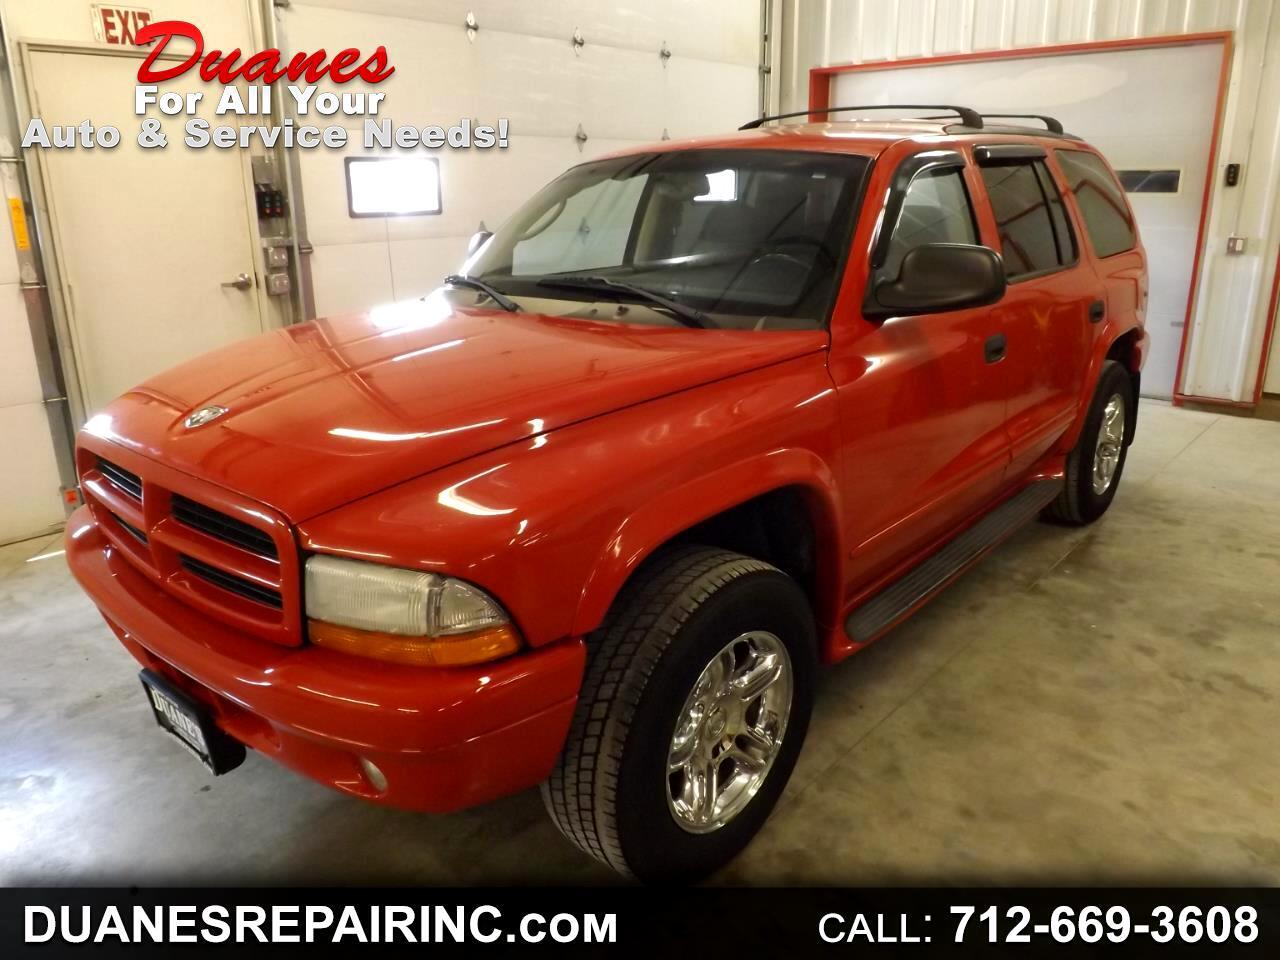 2003 Dodge Durango R/T 4WD